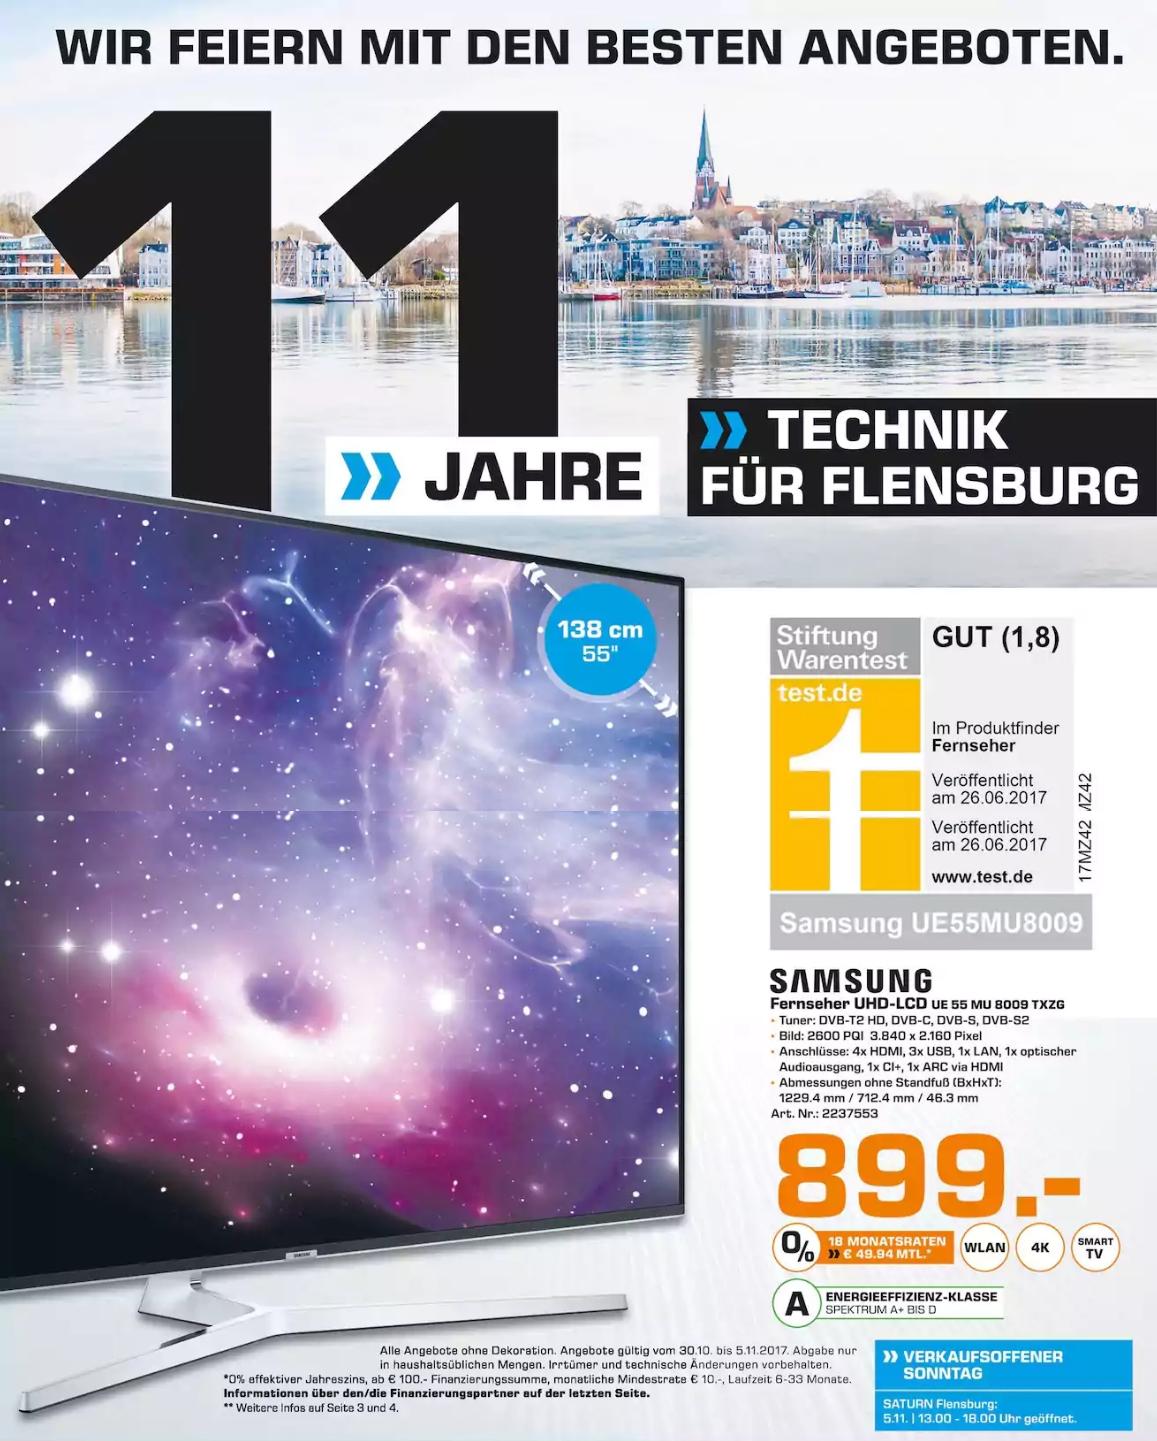 [LOKAL | Saturn | Flensburg] Samsung UE55MU8009 UHD TV